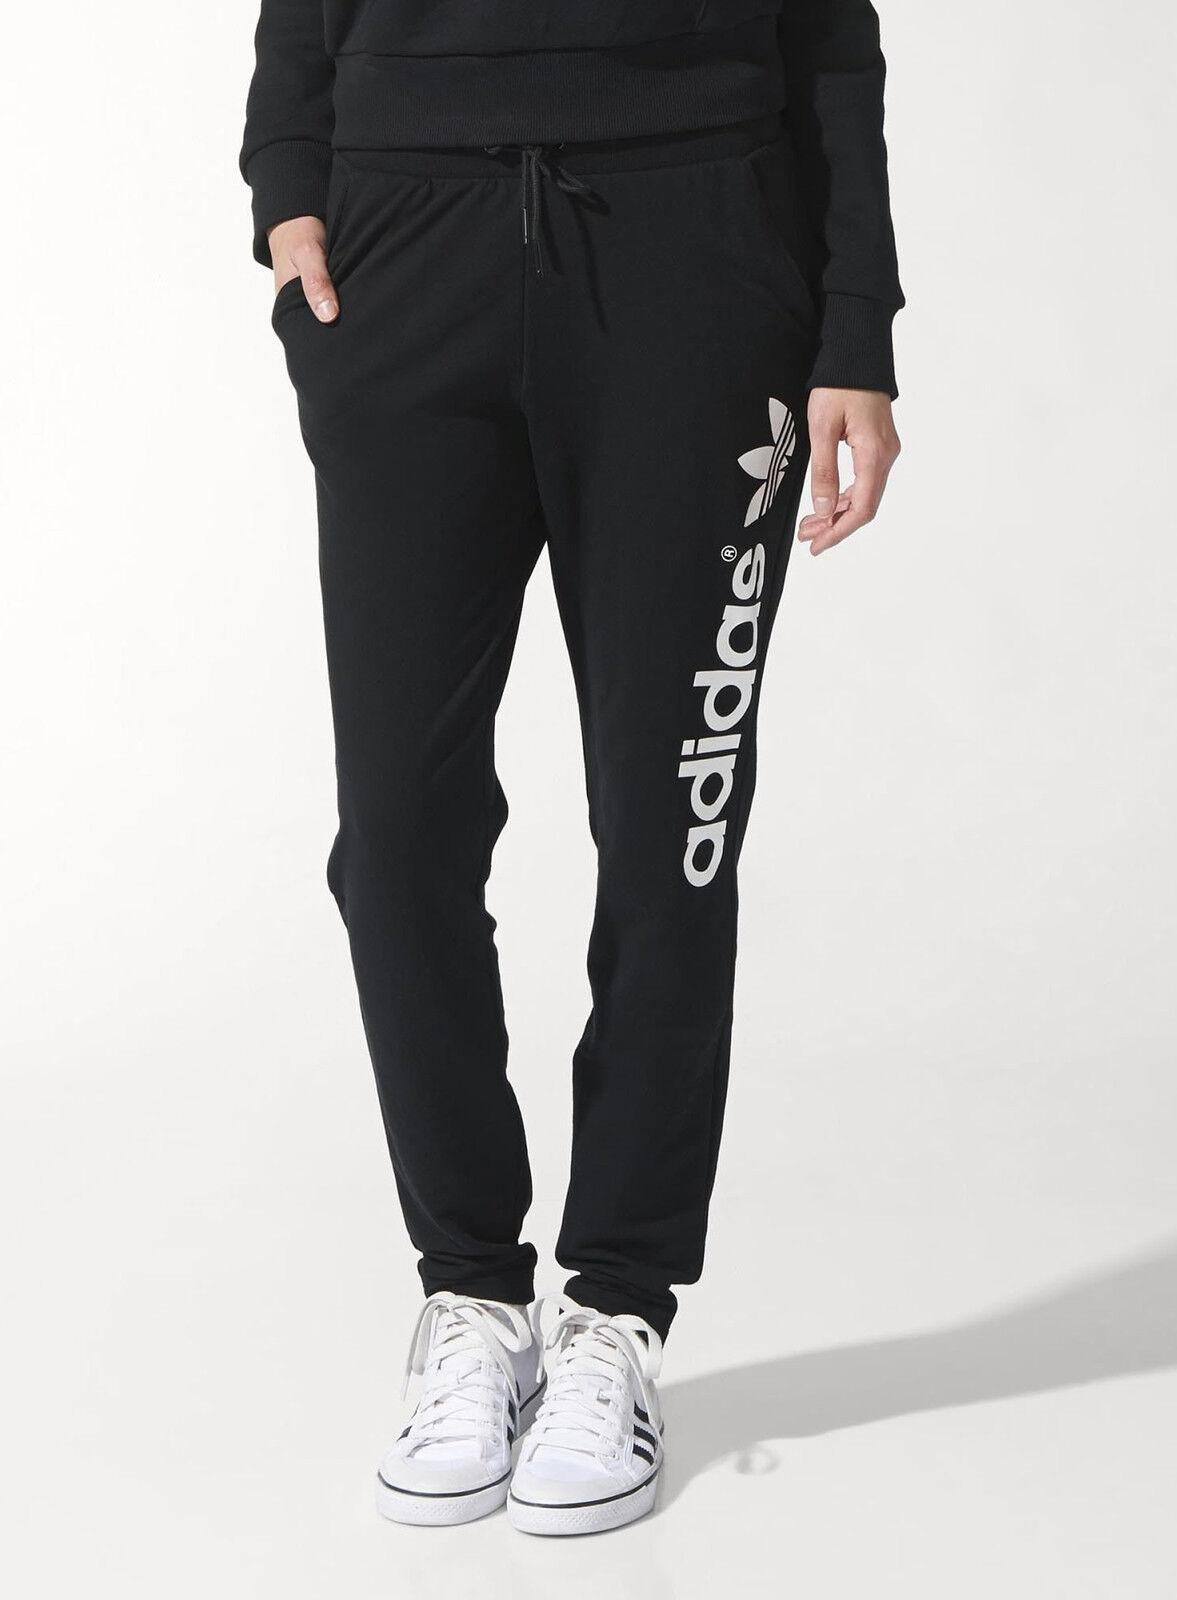 Adidas Adidas Adidas Originali Donna Nuovo Cotone Leggero da Corsa Trifoglio Pantaloni Jogging fedb75